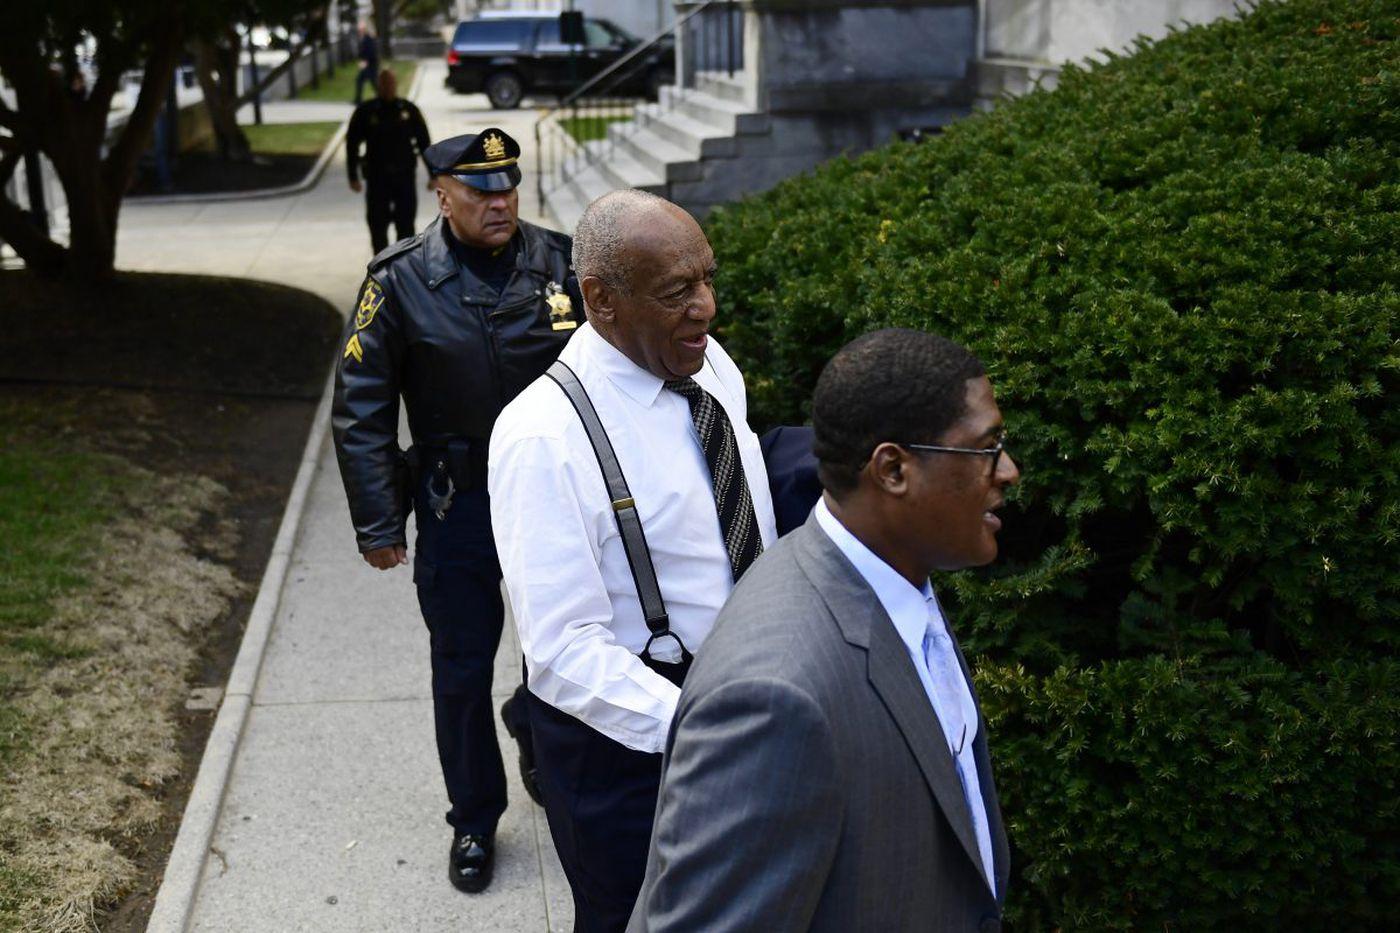 Judge dismisses former DA's lawsuit against Cosby accuser Andrea Constand